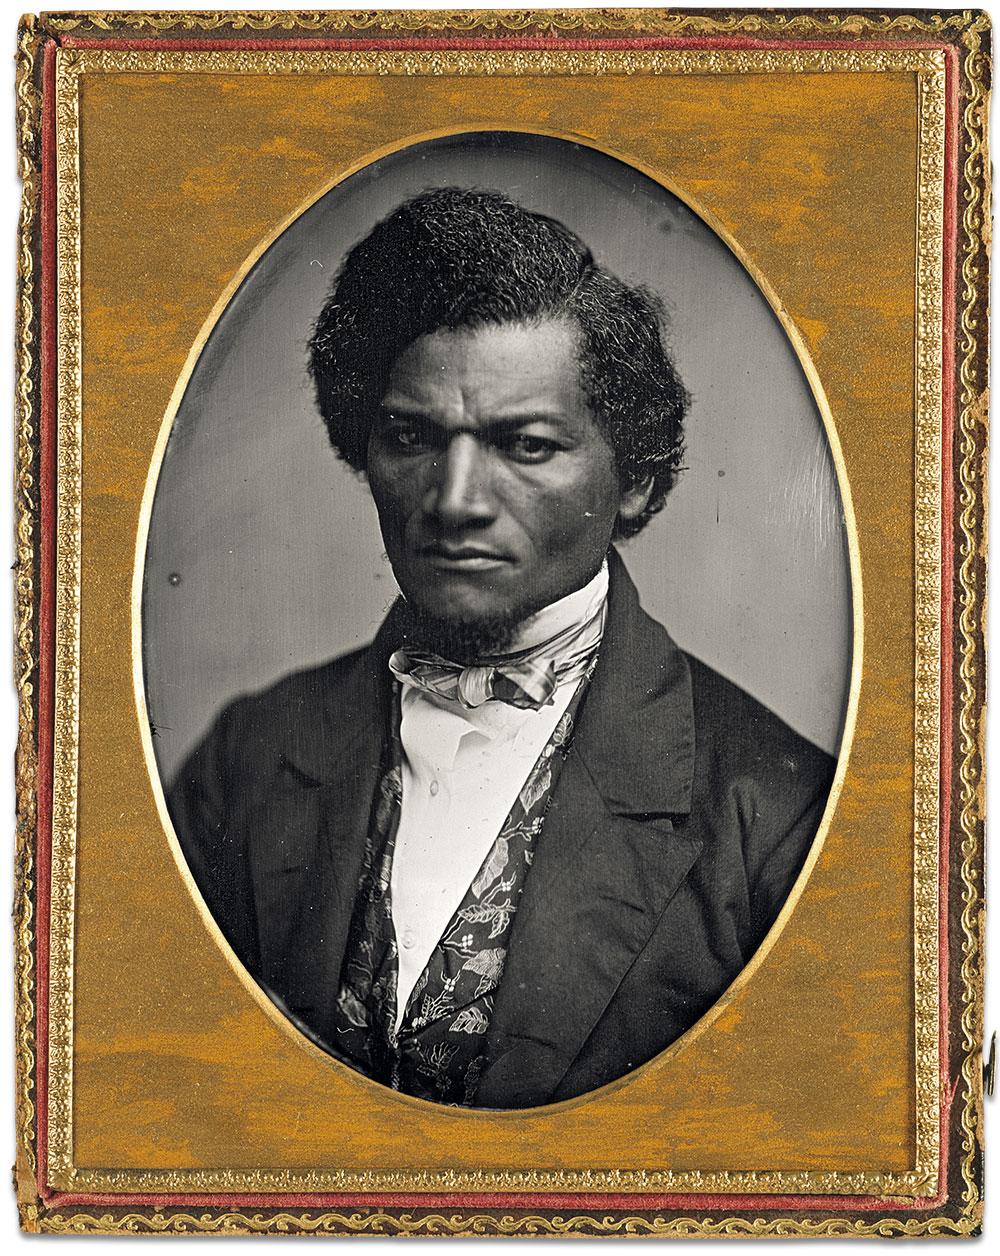 Frederick Douglass. Quarter-plate daguerreotype by Samuel J. Miller. National Gallery of Art.